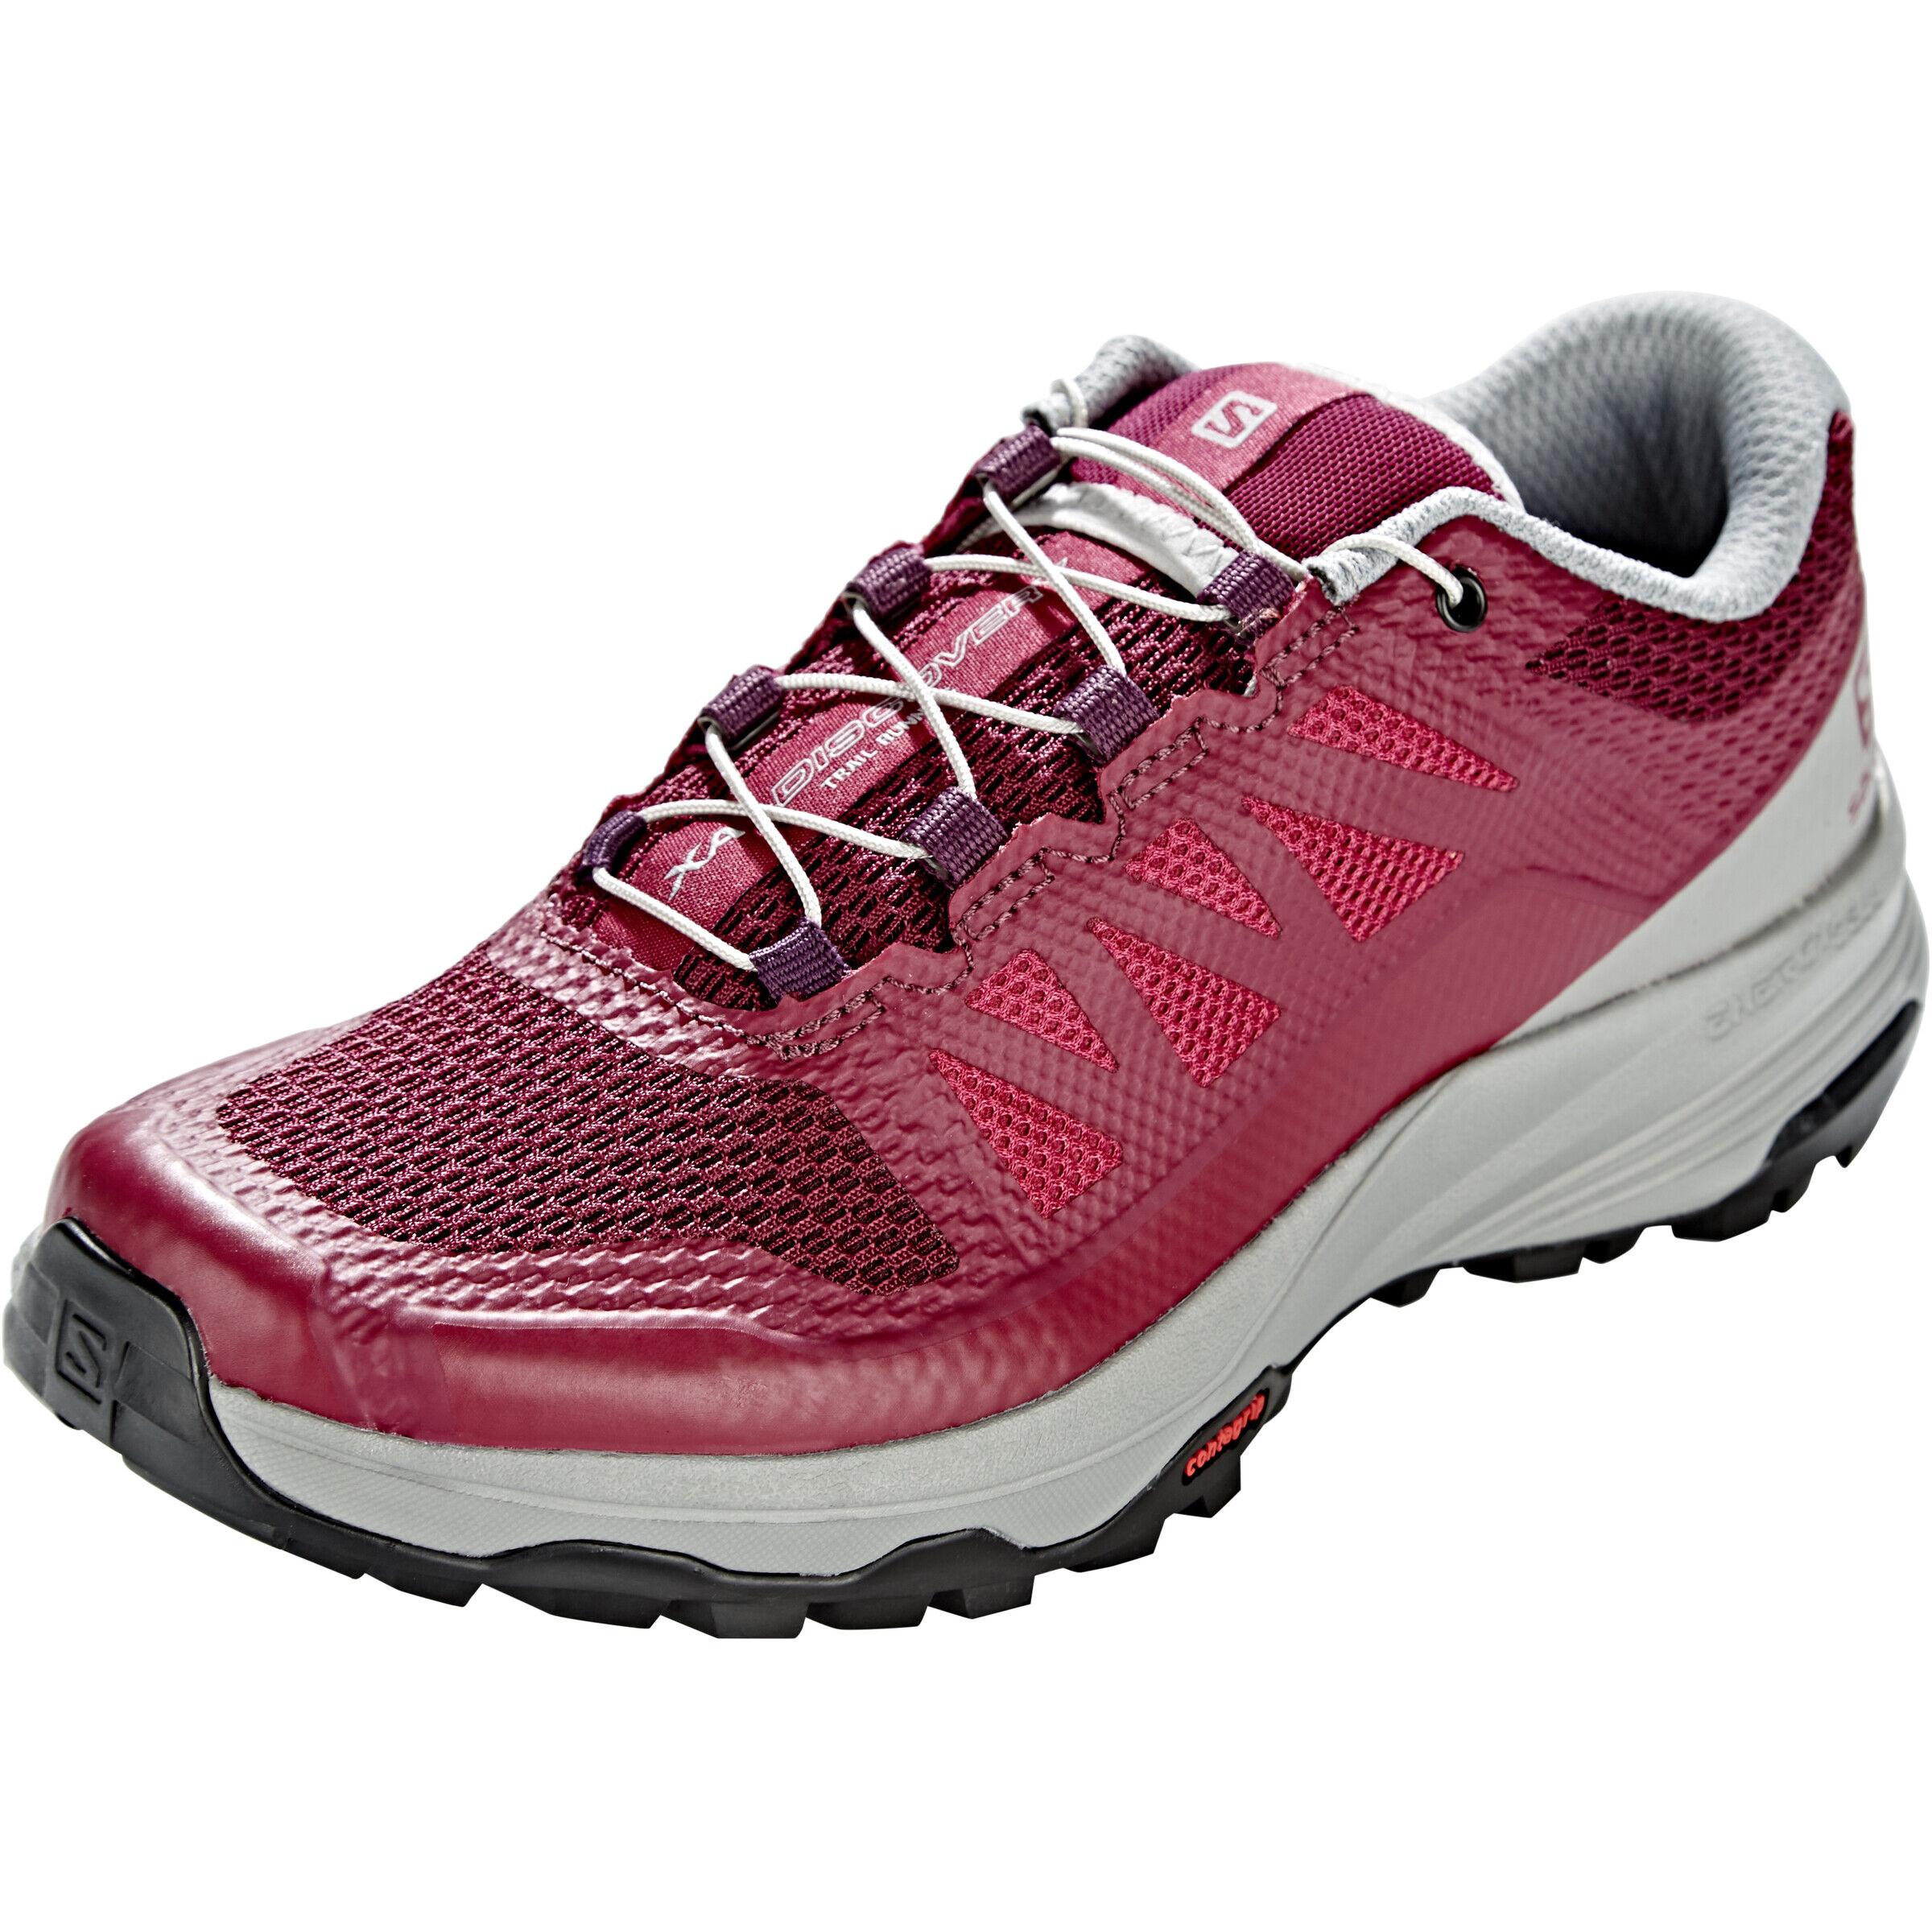 Salomon XA Discovery Schuhe Damen beet redmonumentcerise.